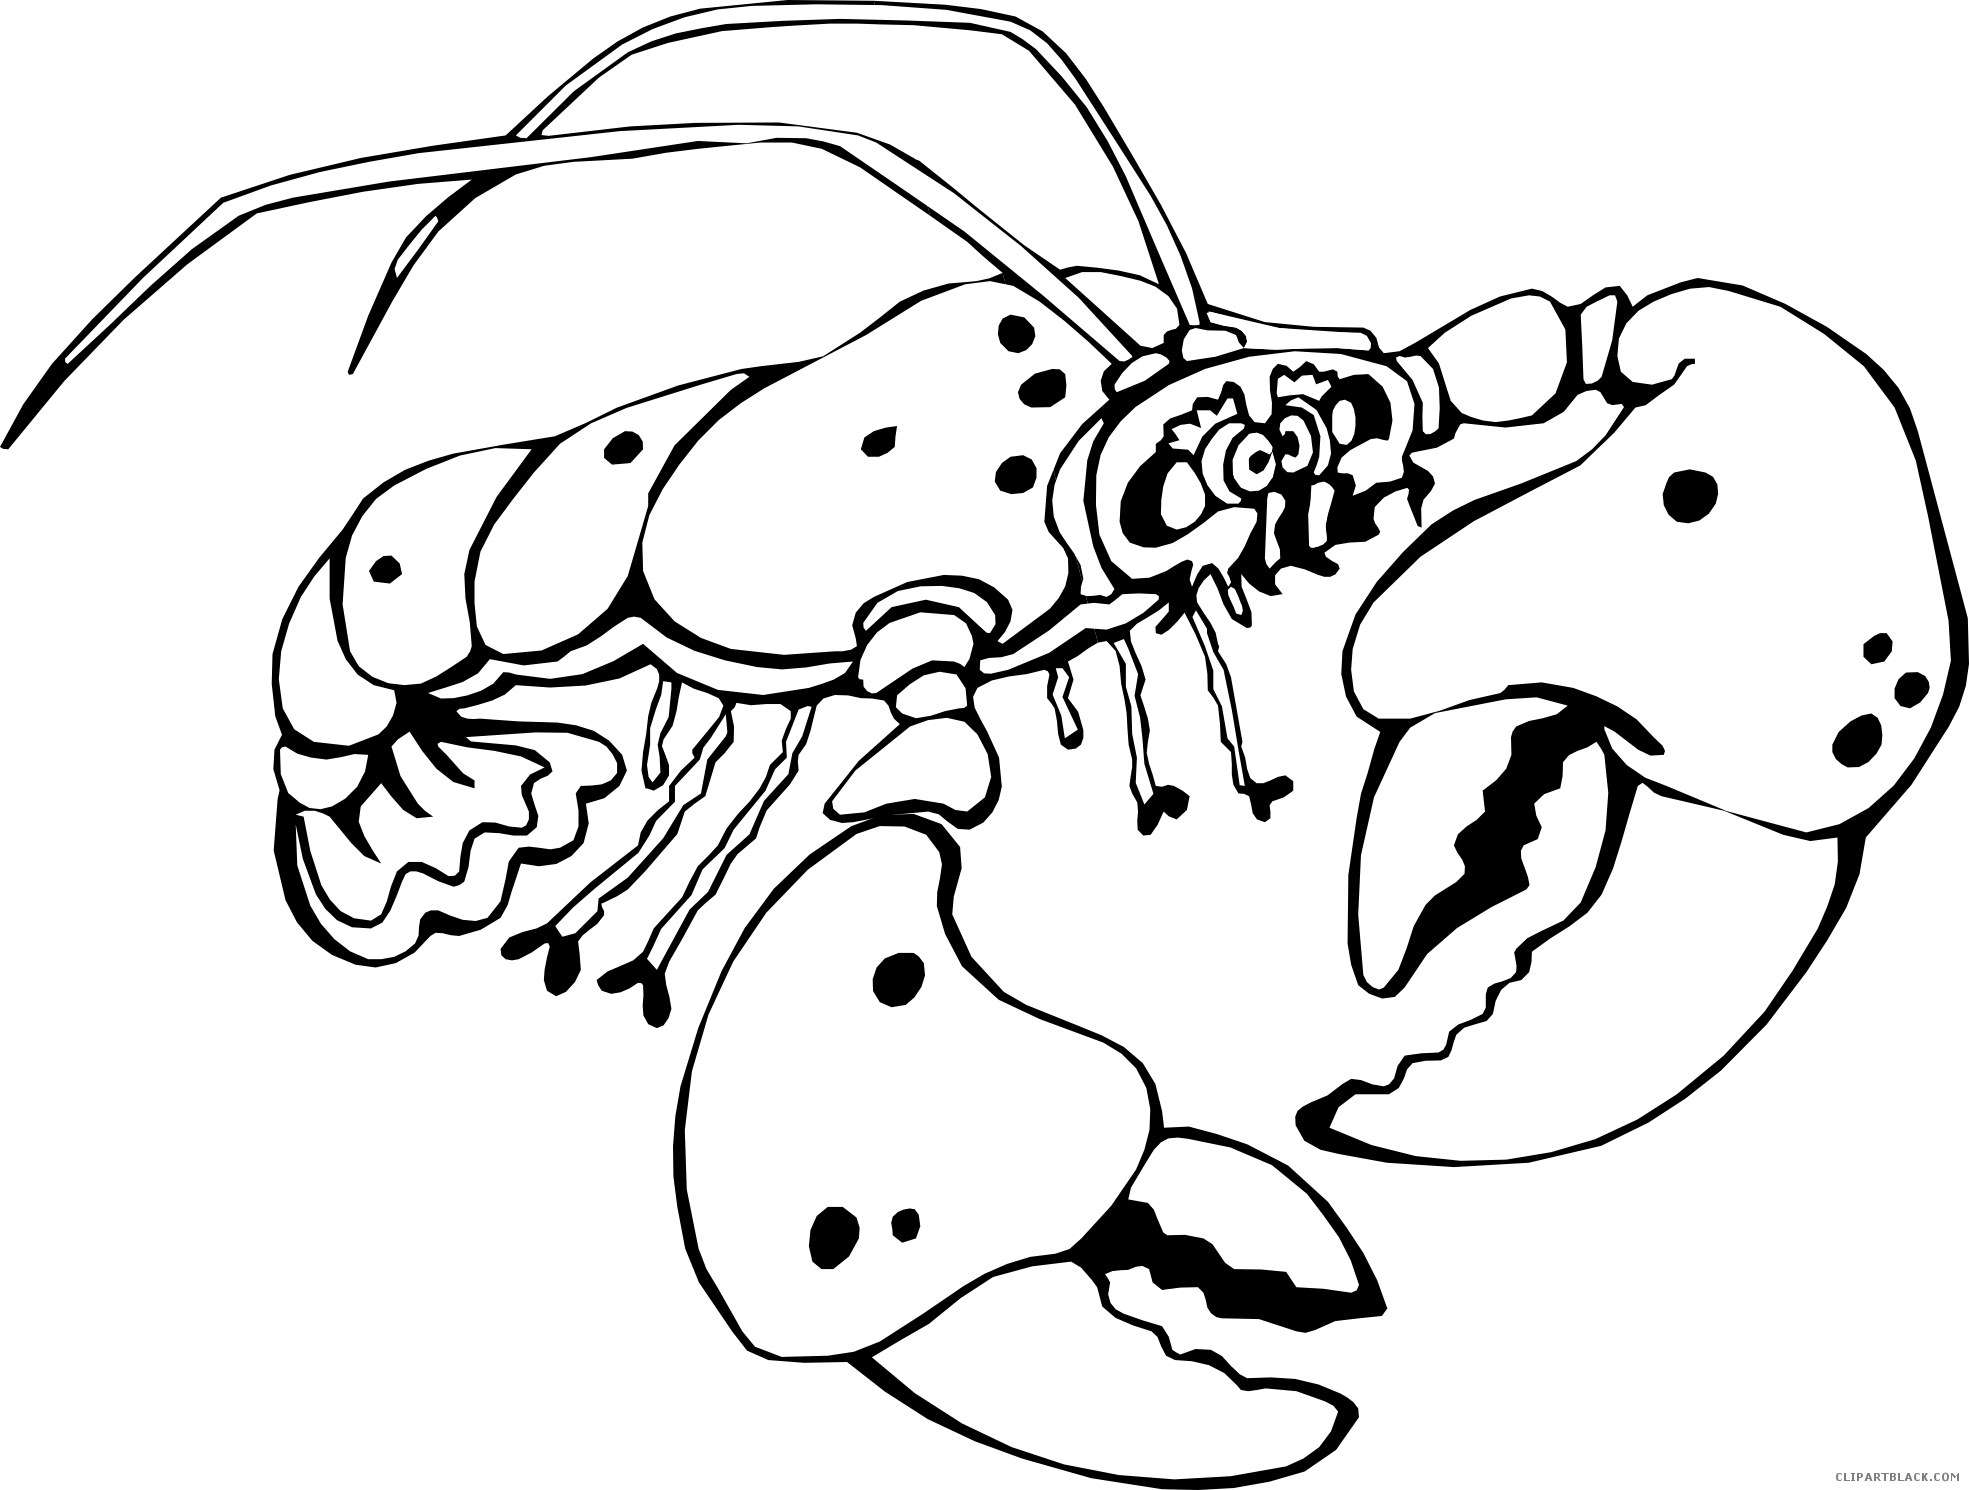 Outline clipartblack com animal. Lobster clipart clip art